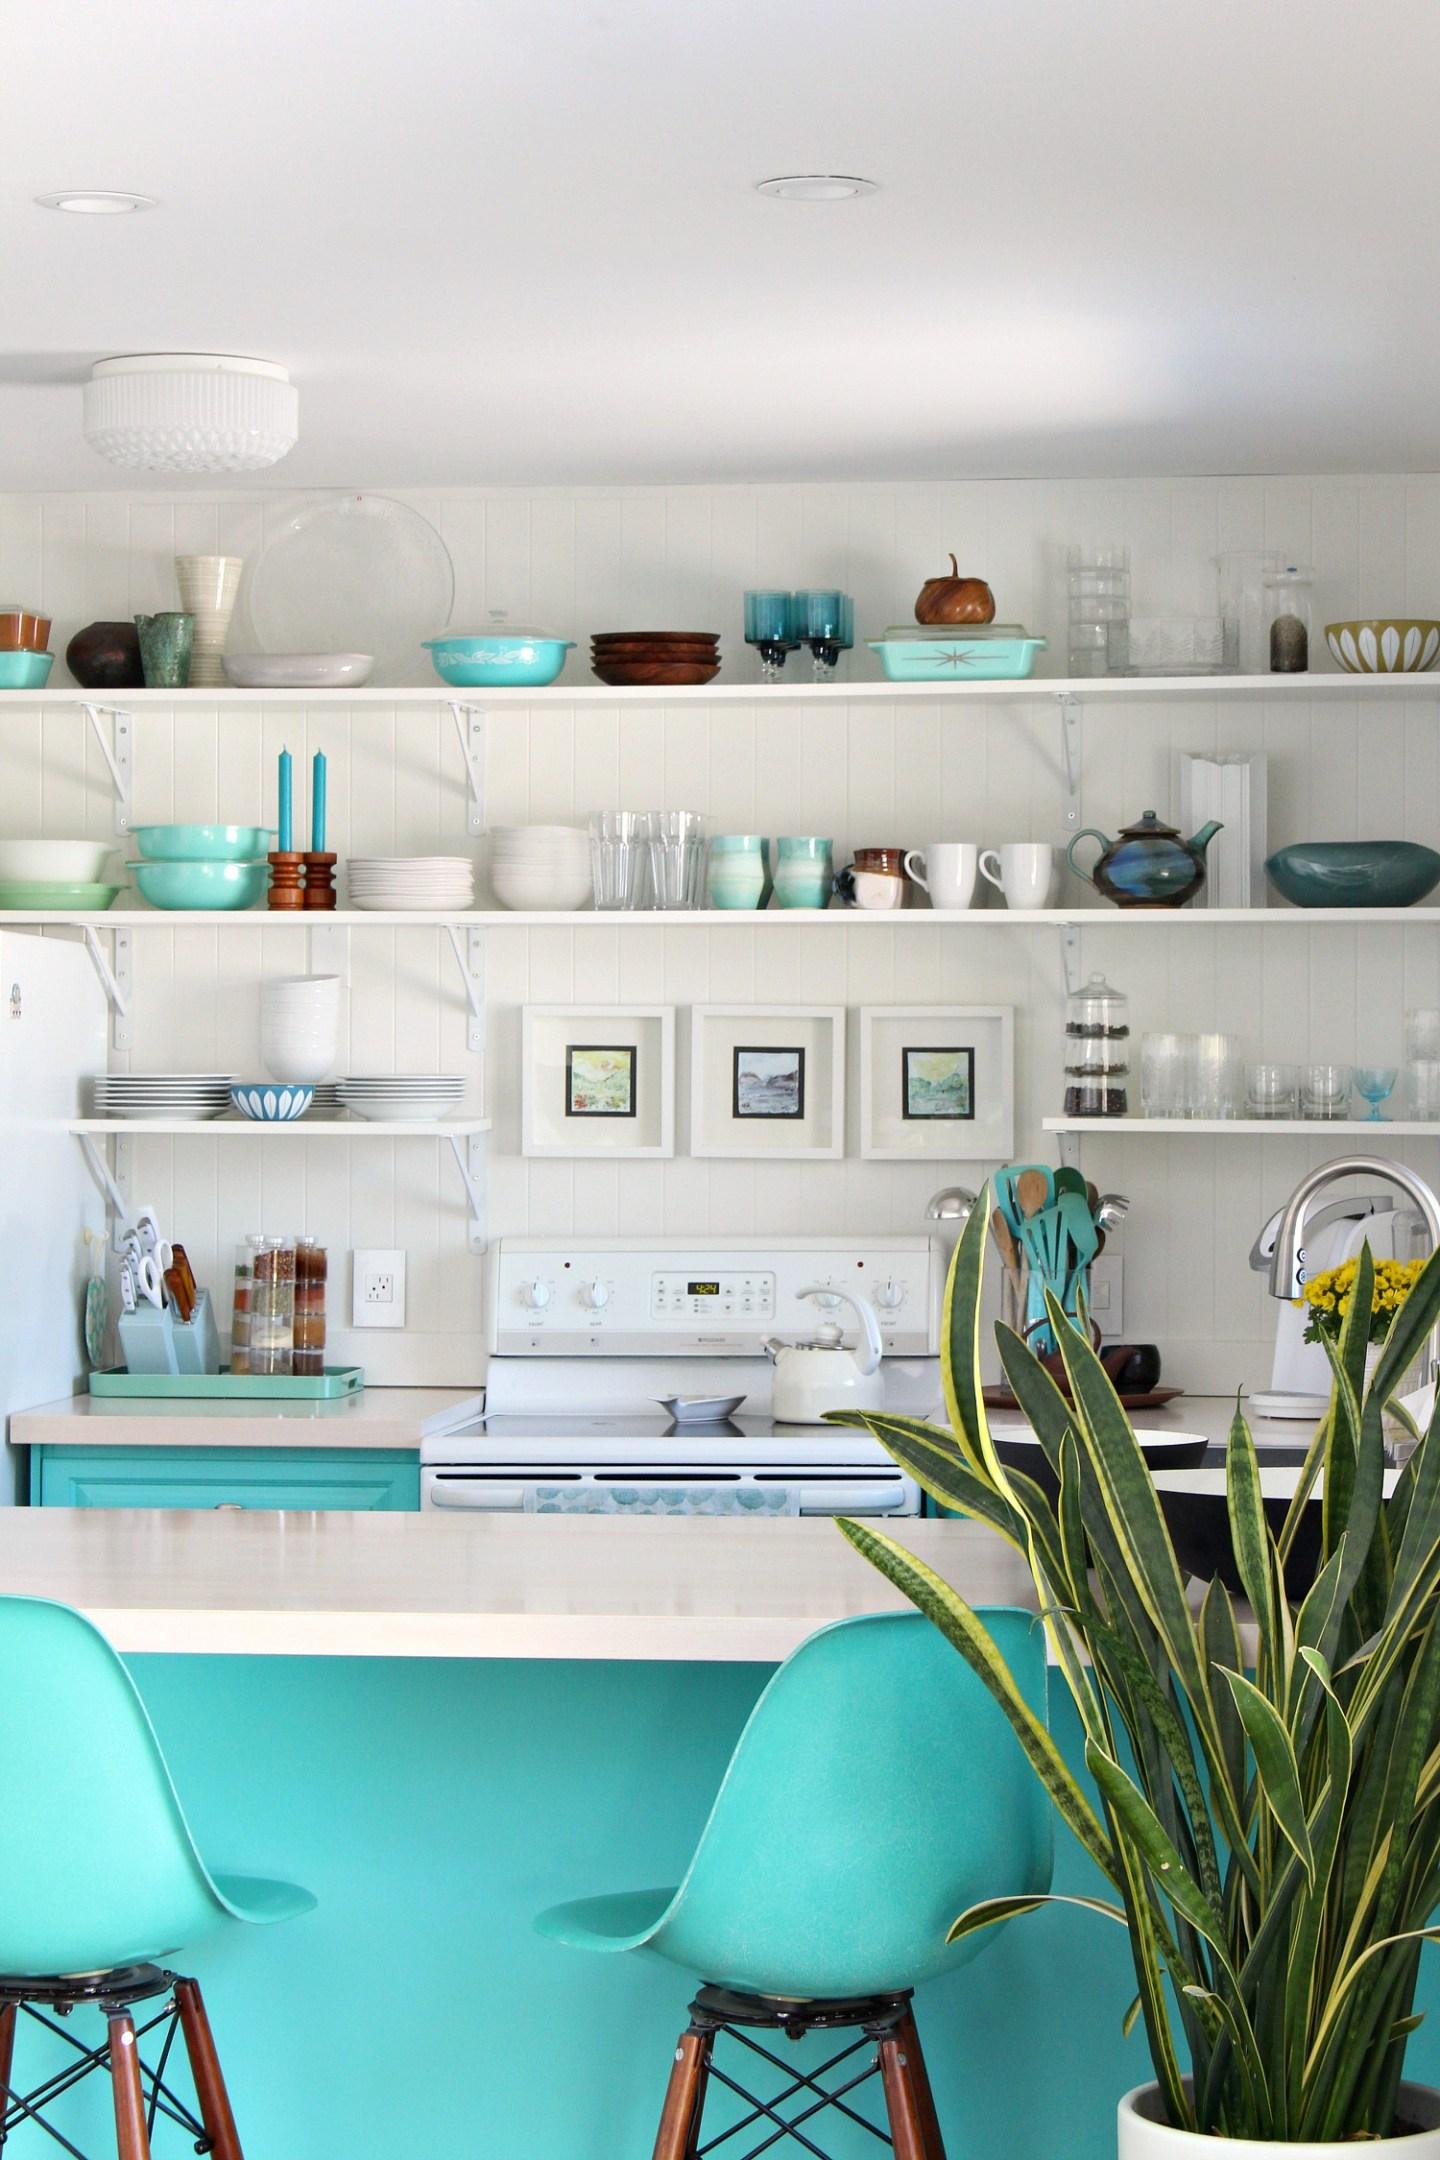 Easy Open Shelving Idea for the Kitchen. Kitchen Open Shelving Ideas and Kitchen Open Shelving DIY. #openshelving